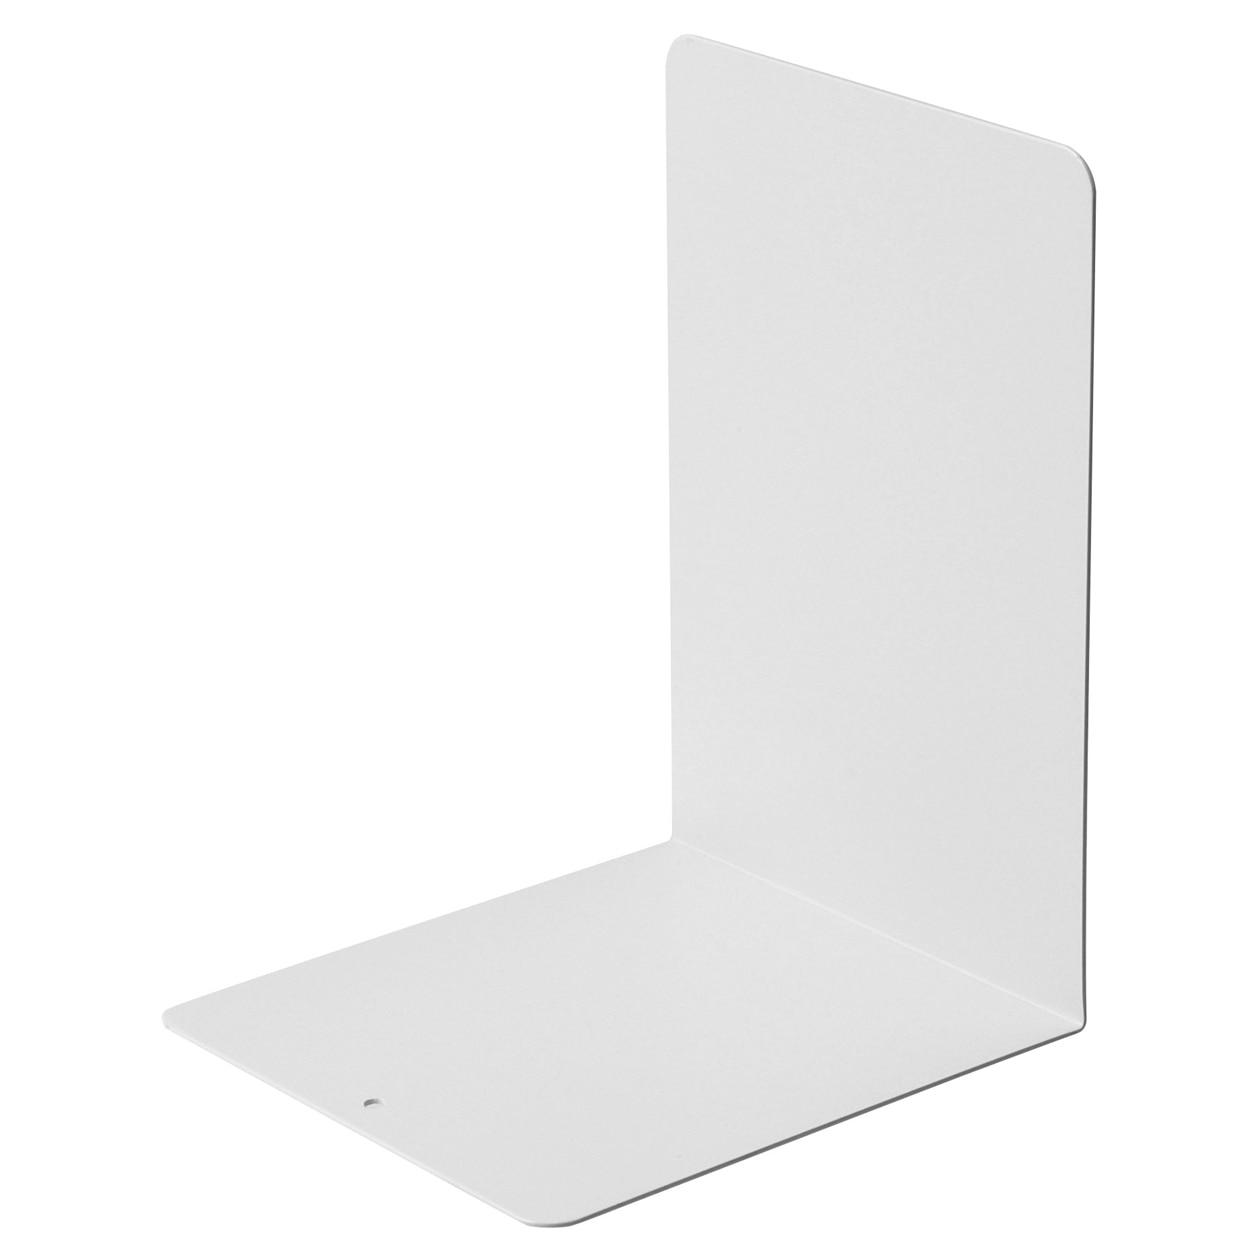 RoomClip商品情報 - スチール仕切板